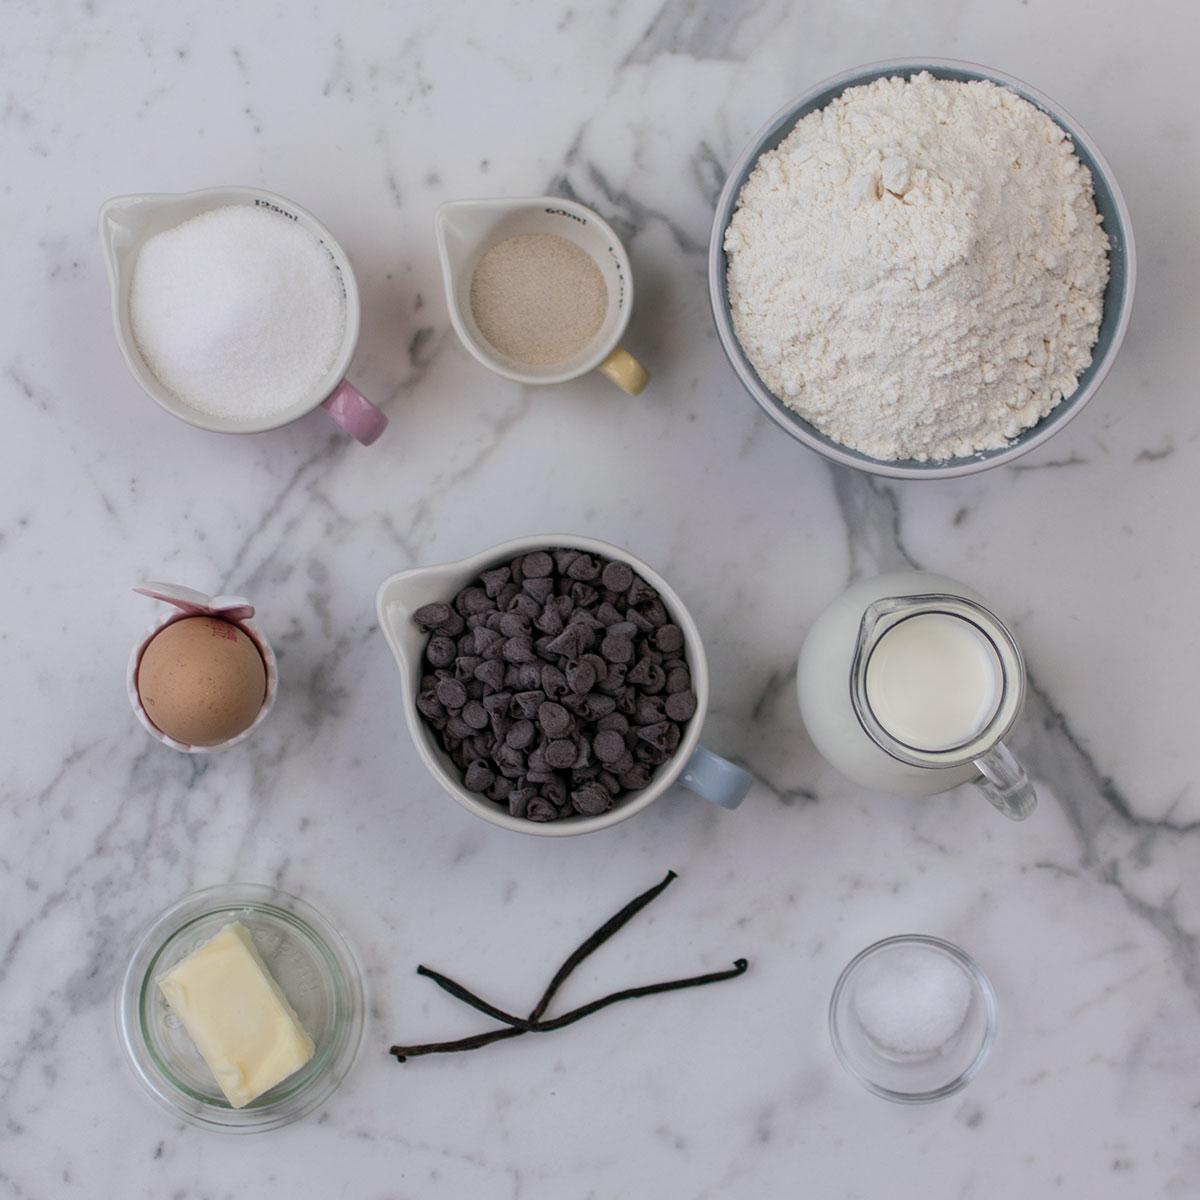 pan_goccioli_ingredienti